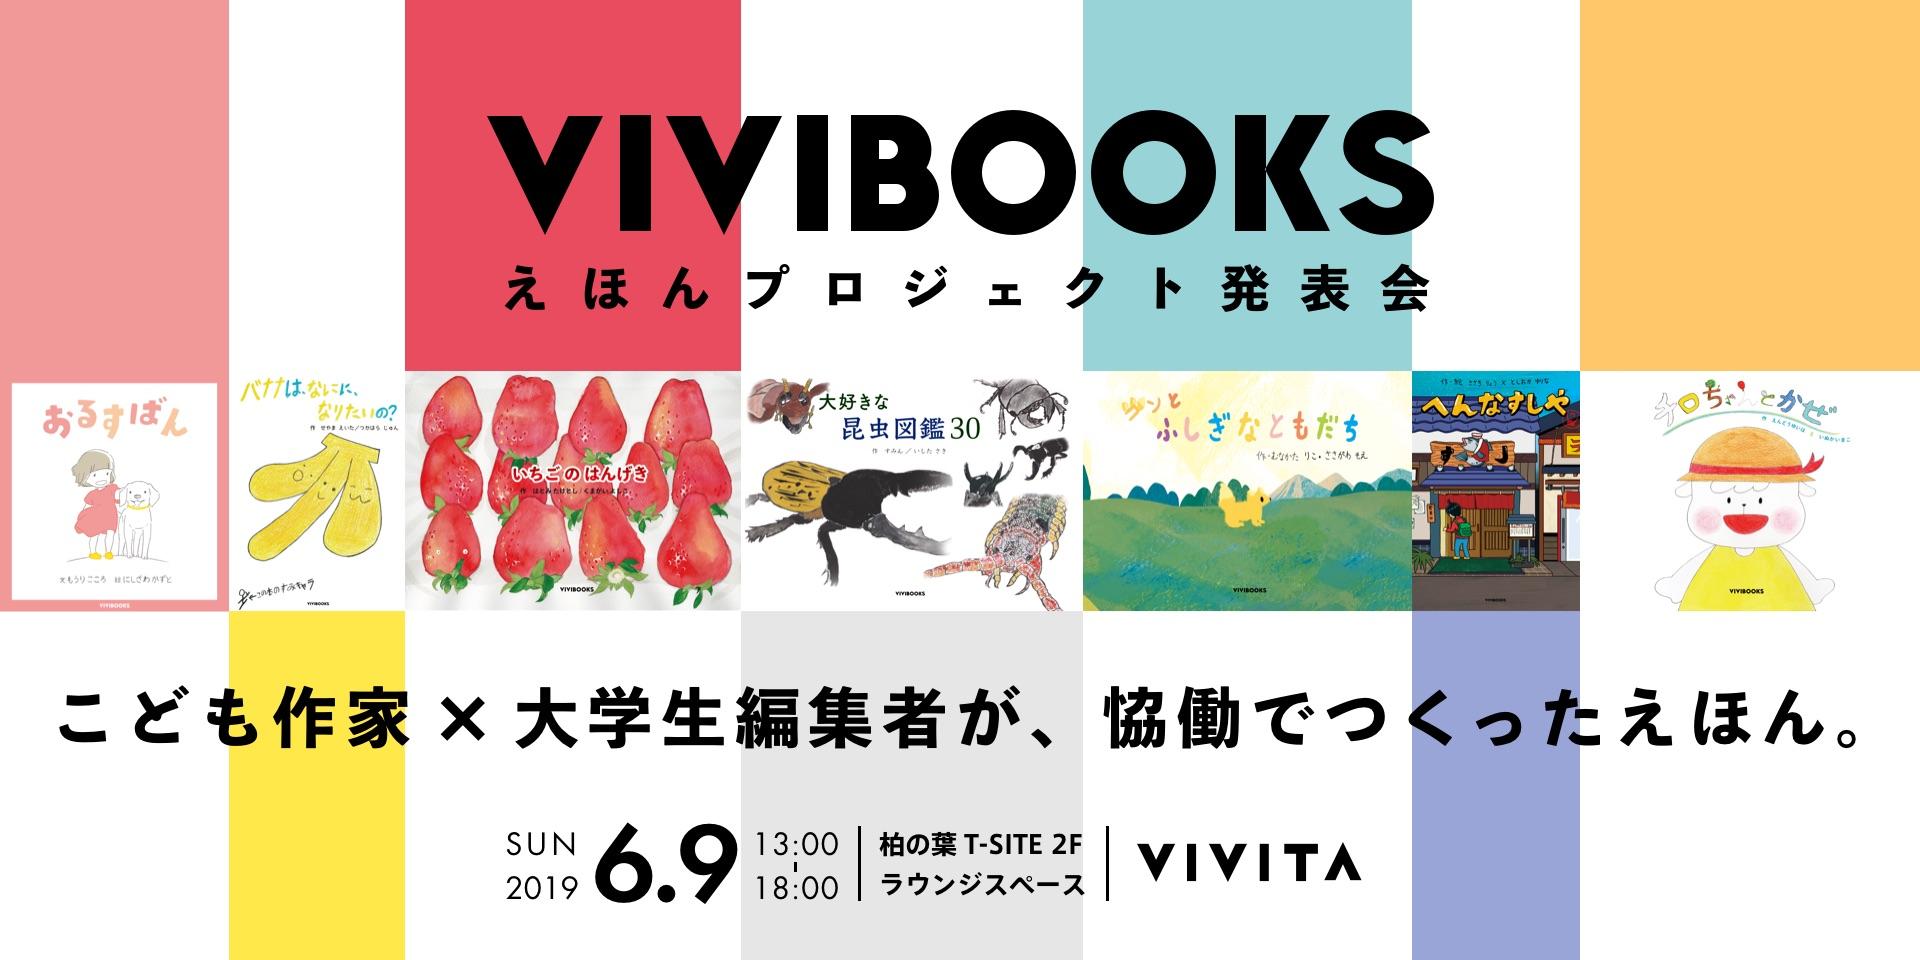 VIVIBOOKS<br>えほんプロジェクト発表会